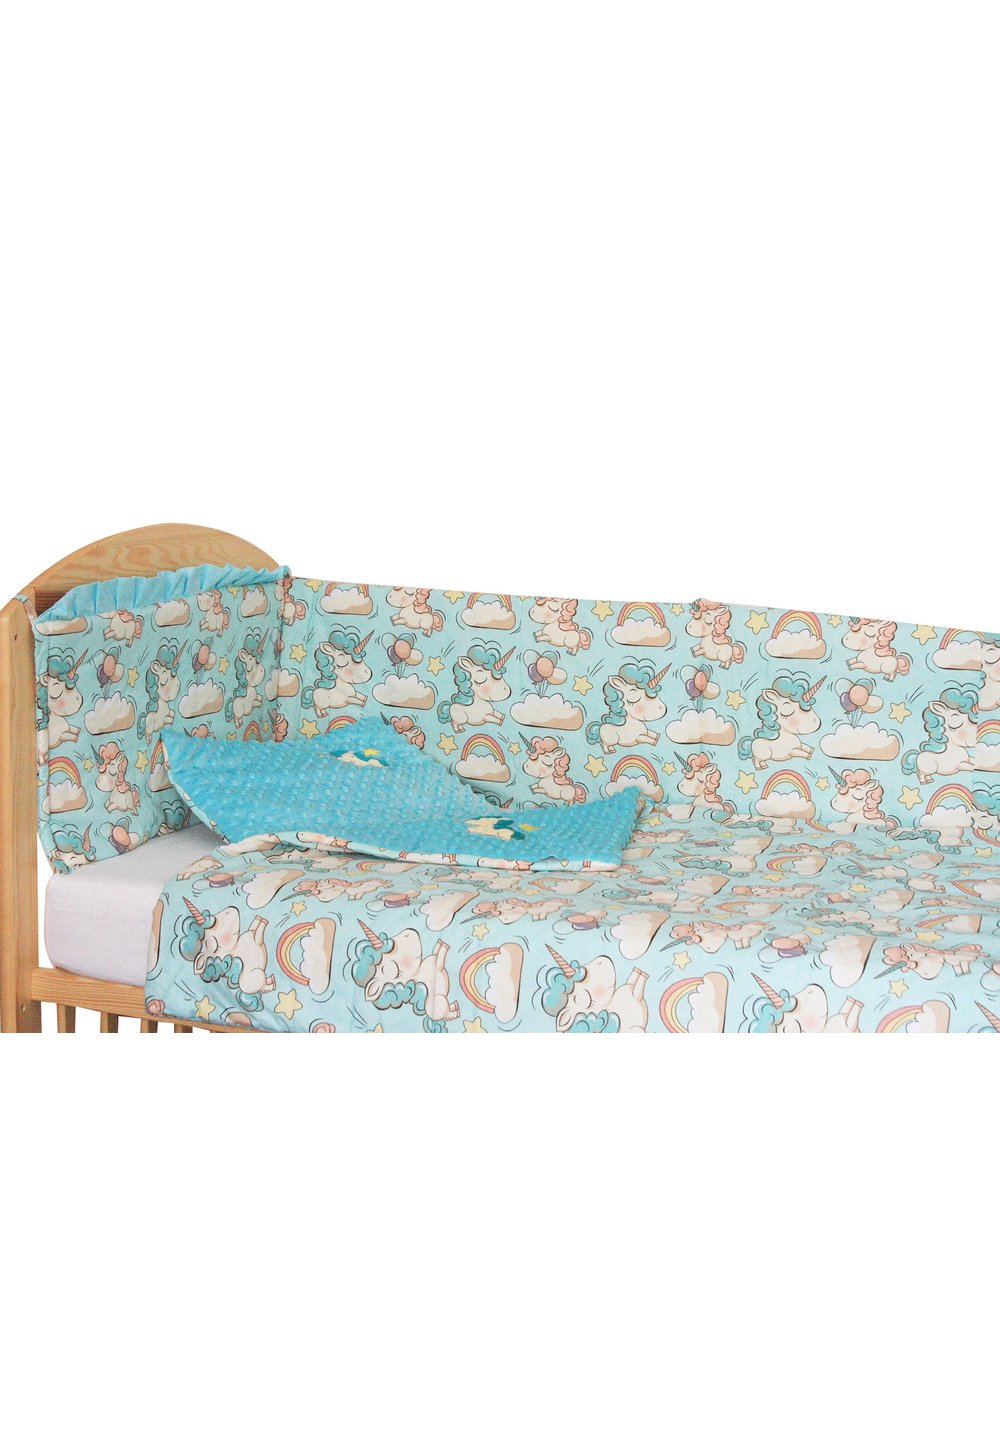 Lenjerie patut, 5 piese, Unicorn turcoaz, 120 x 60 cm imagine